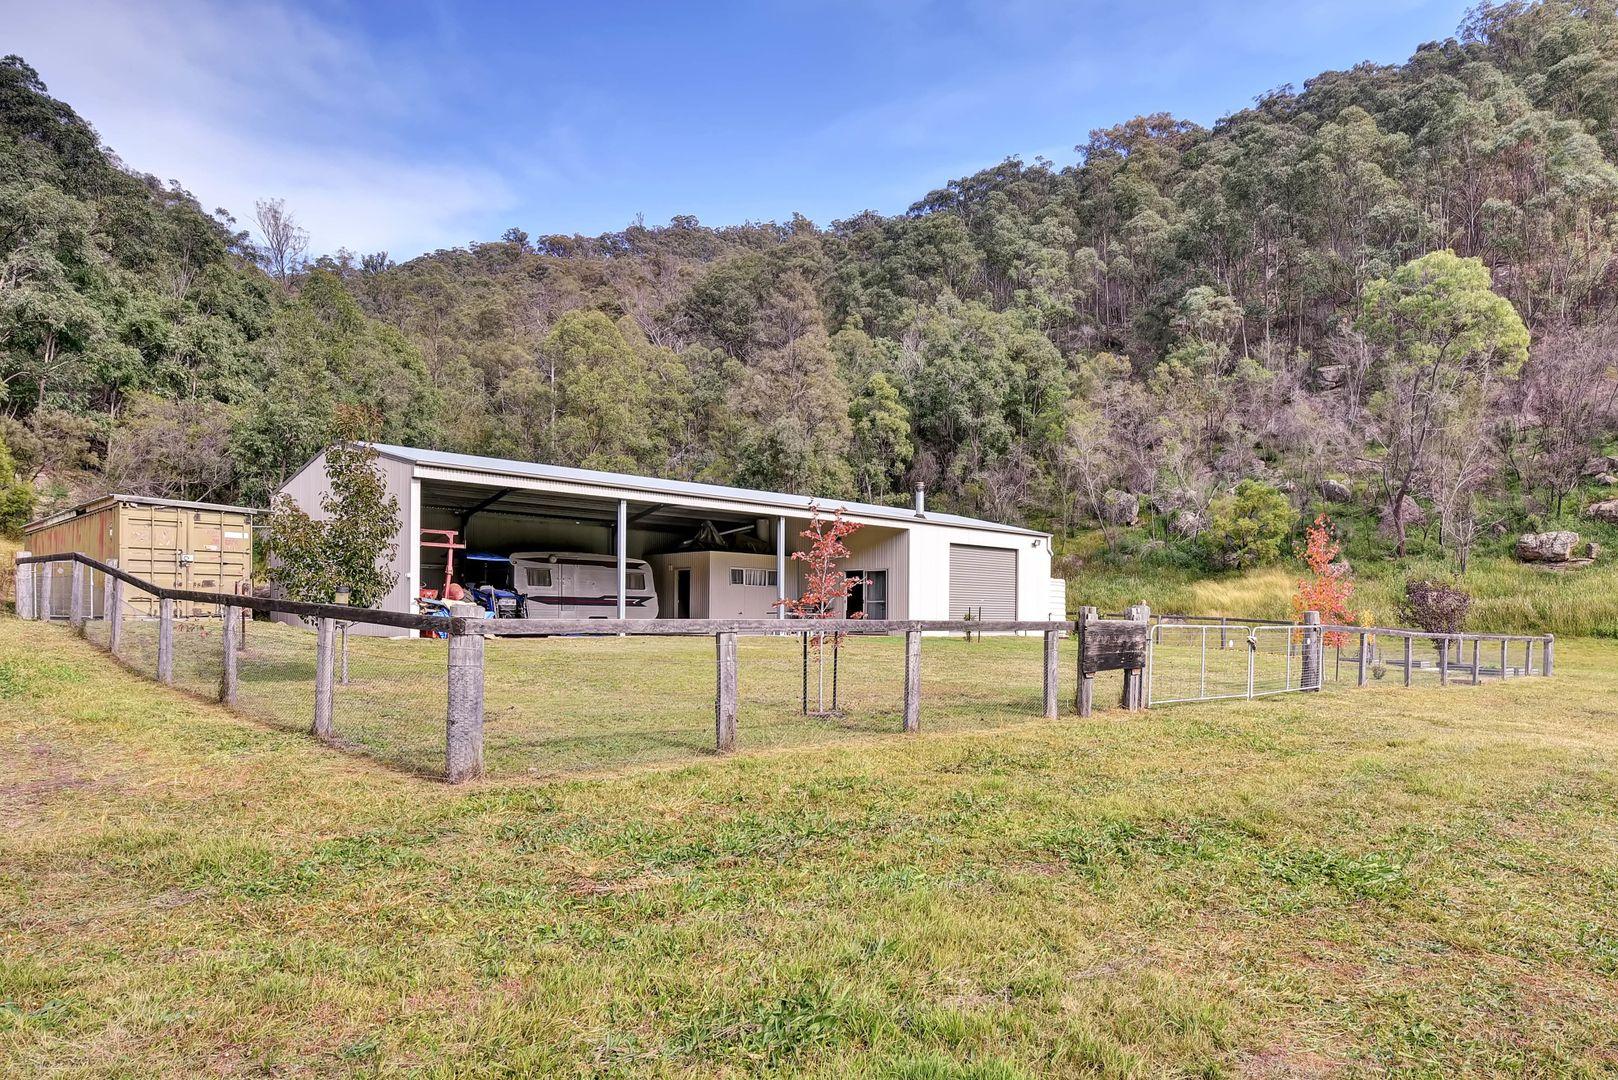 173 Bagnalls Creek Rd, Paynes Crossing NSW 2325, Image 0